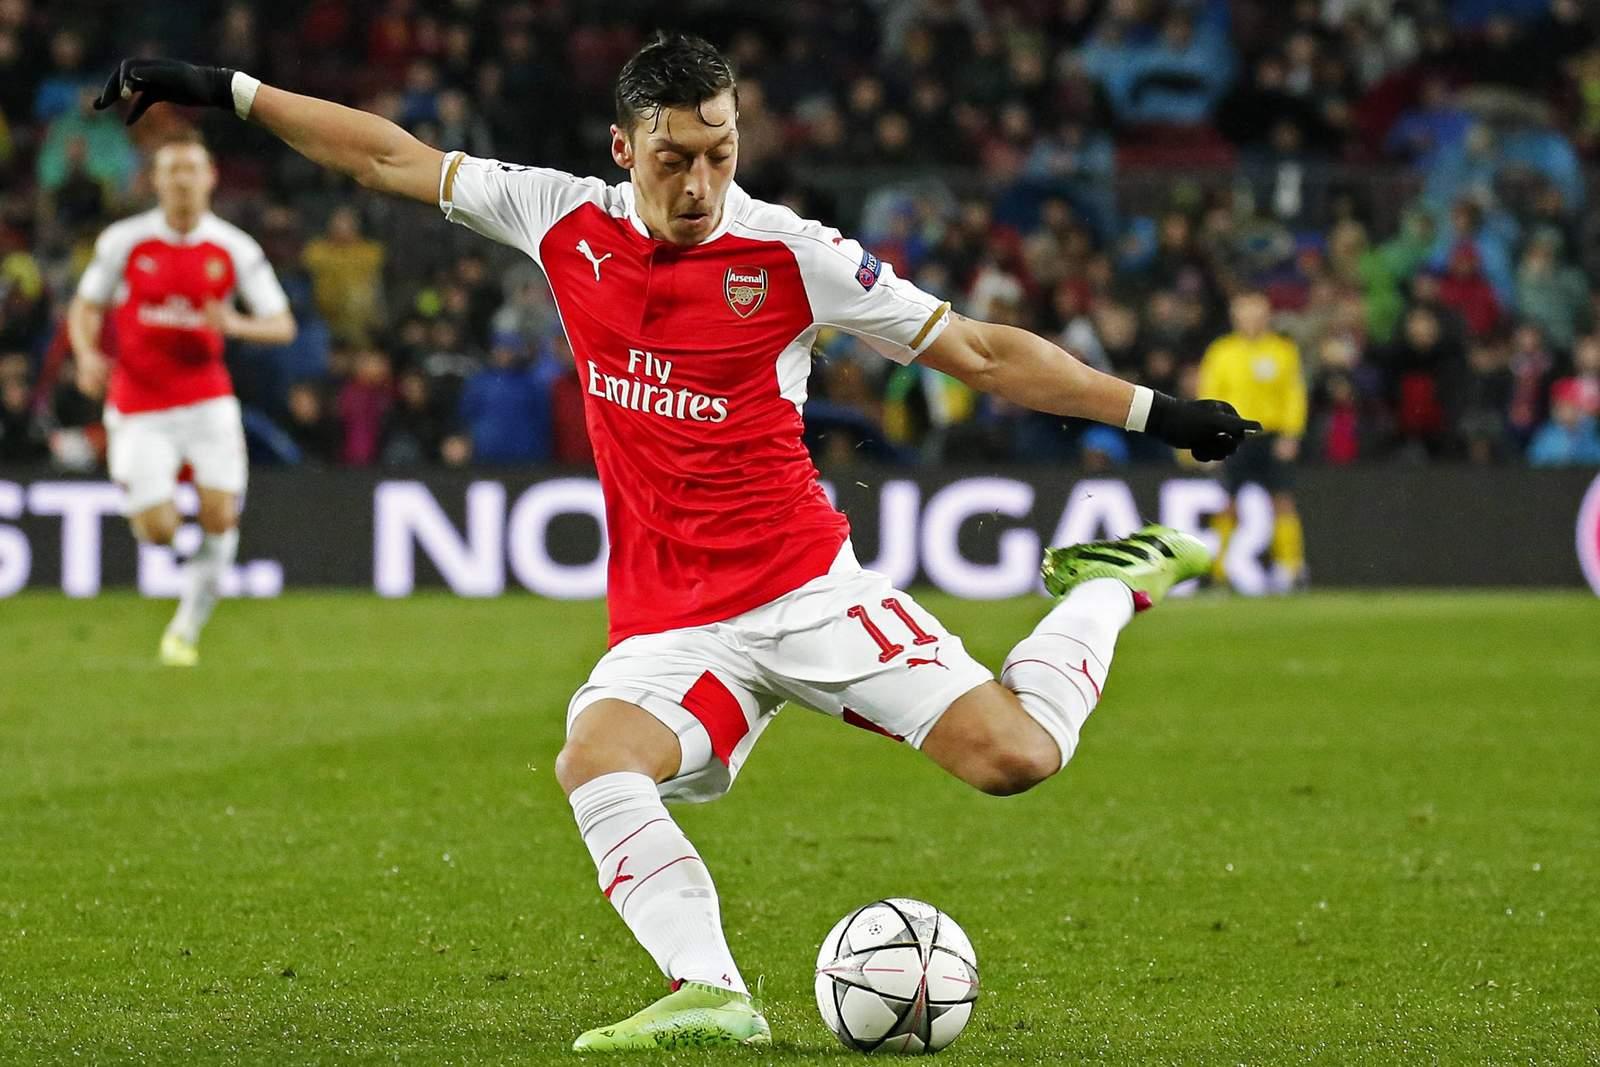 Mesut Özil zieht ab. Jetzt auf Chelsea gegen Arsenal wetten!